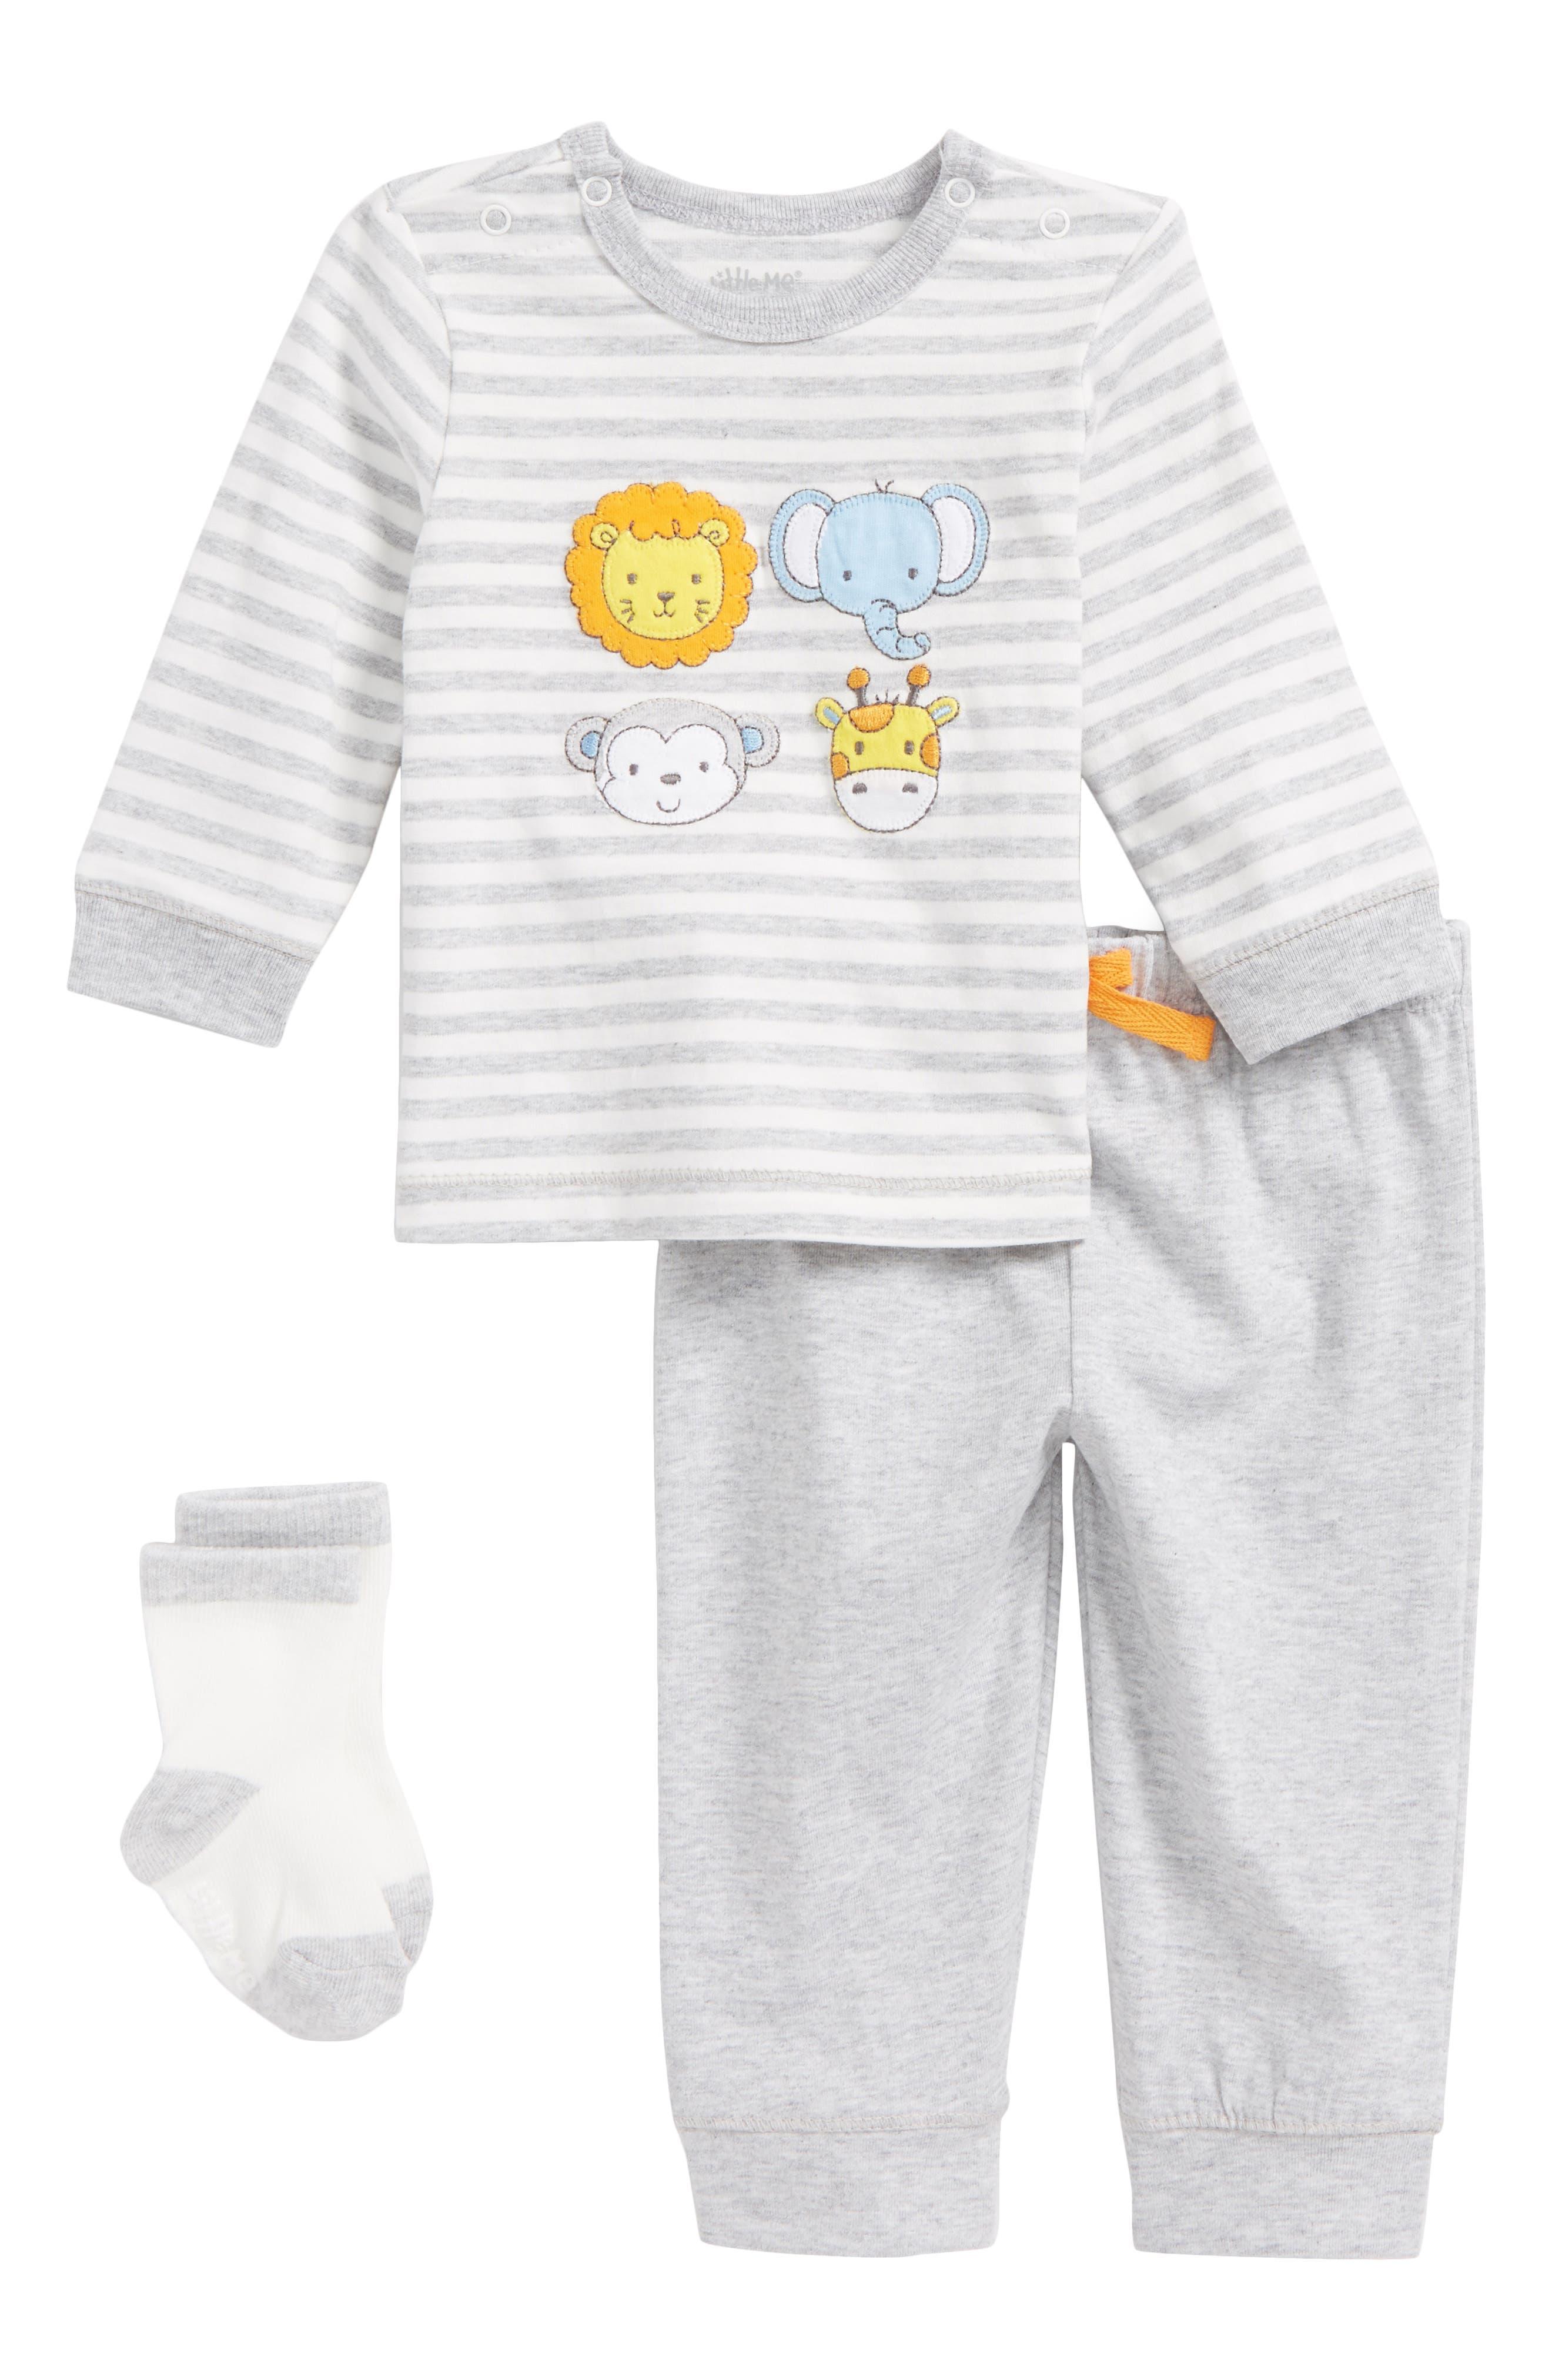 Main Image - Little Me Safari Pals T-Shirt, Jogger Pants & Socks Set (Baby)